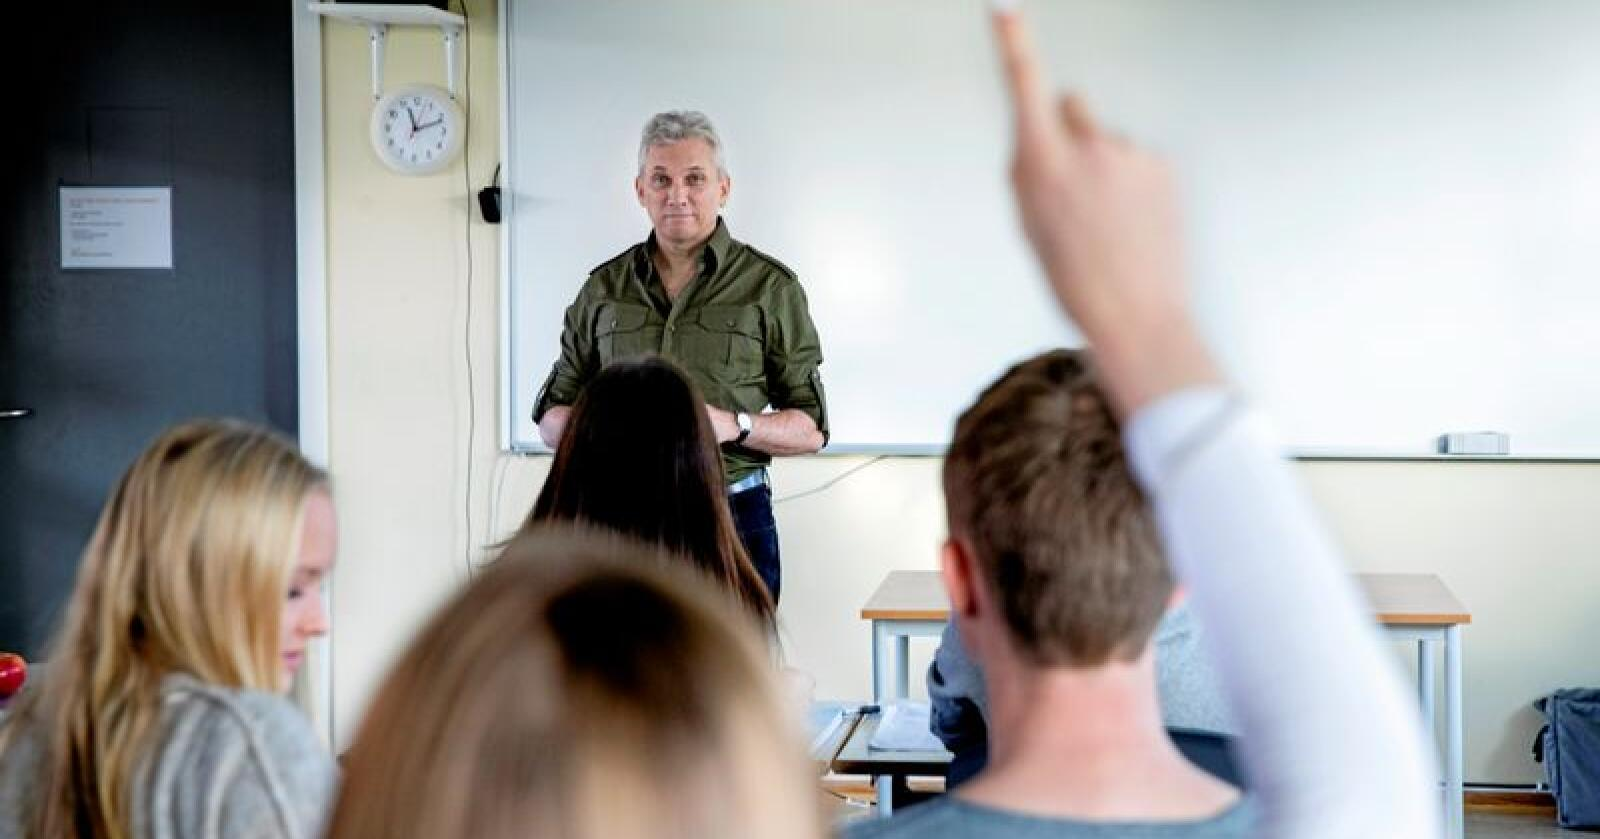 Lærarar, uavhengig av fag dei underviser i, skal kunna nynorsk, skriv innsendaren. Foto: Berit Roald / NTB scanpix